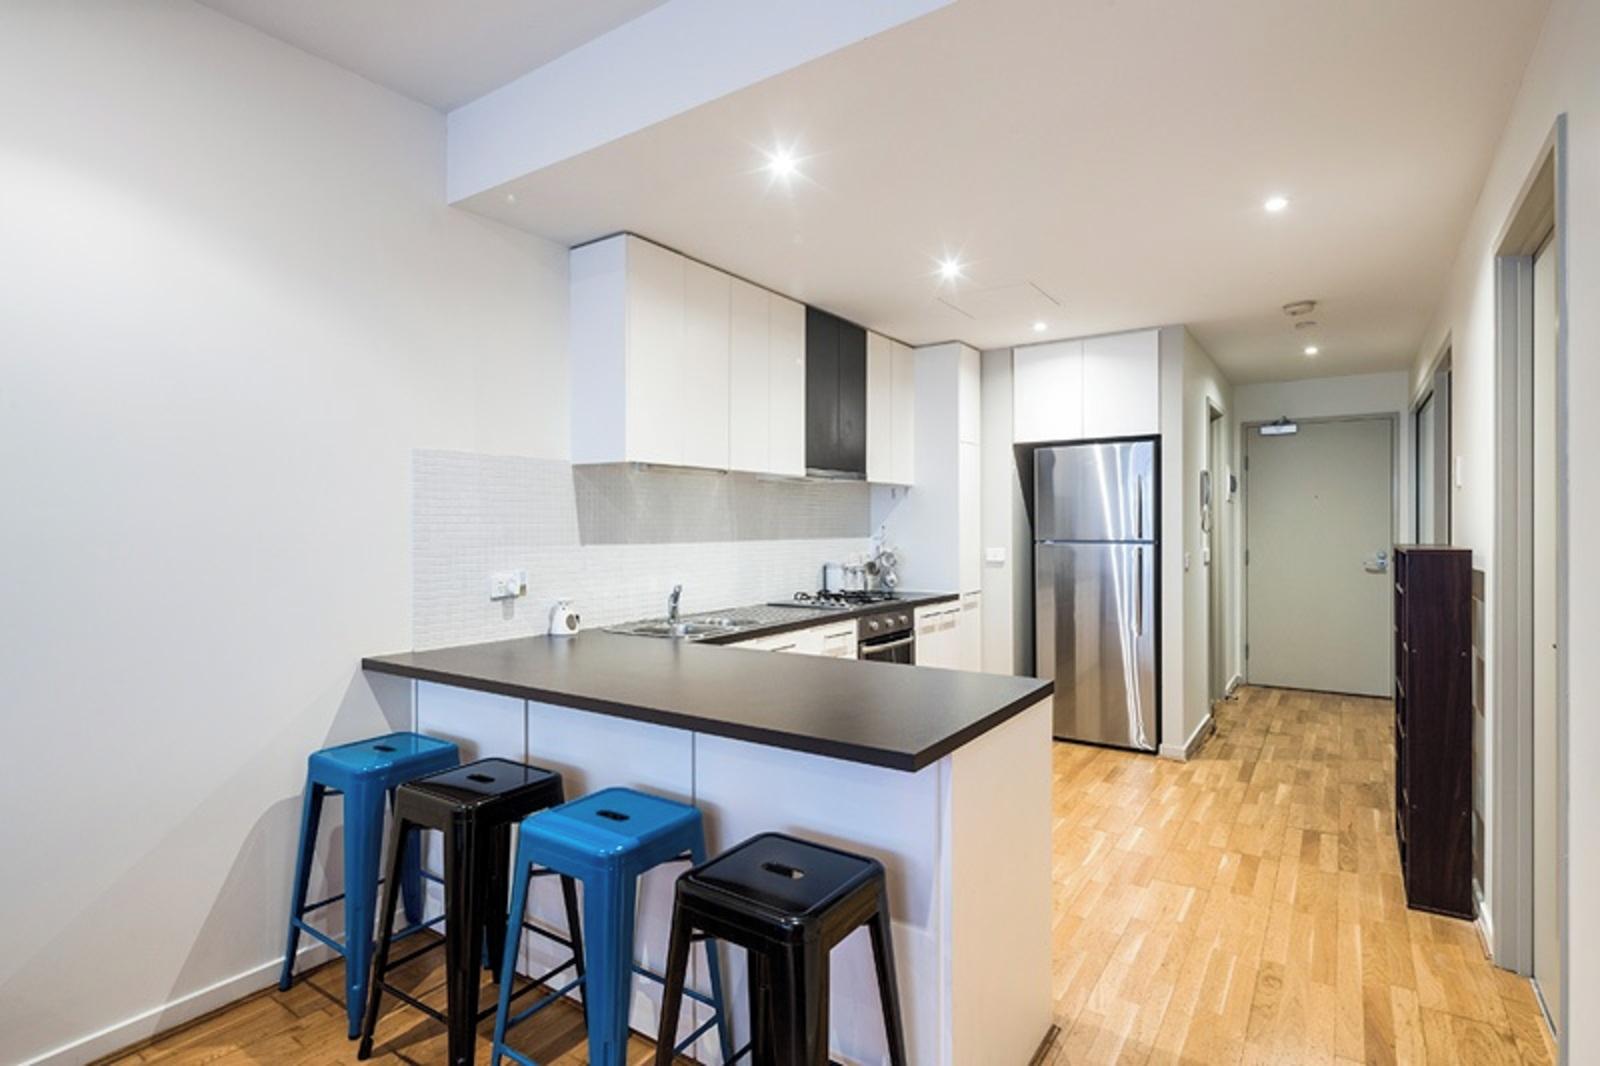 208/54 Nott Street, Port Melbourne 3207 - Image 5